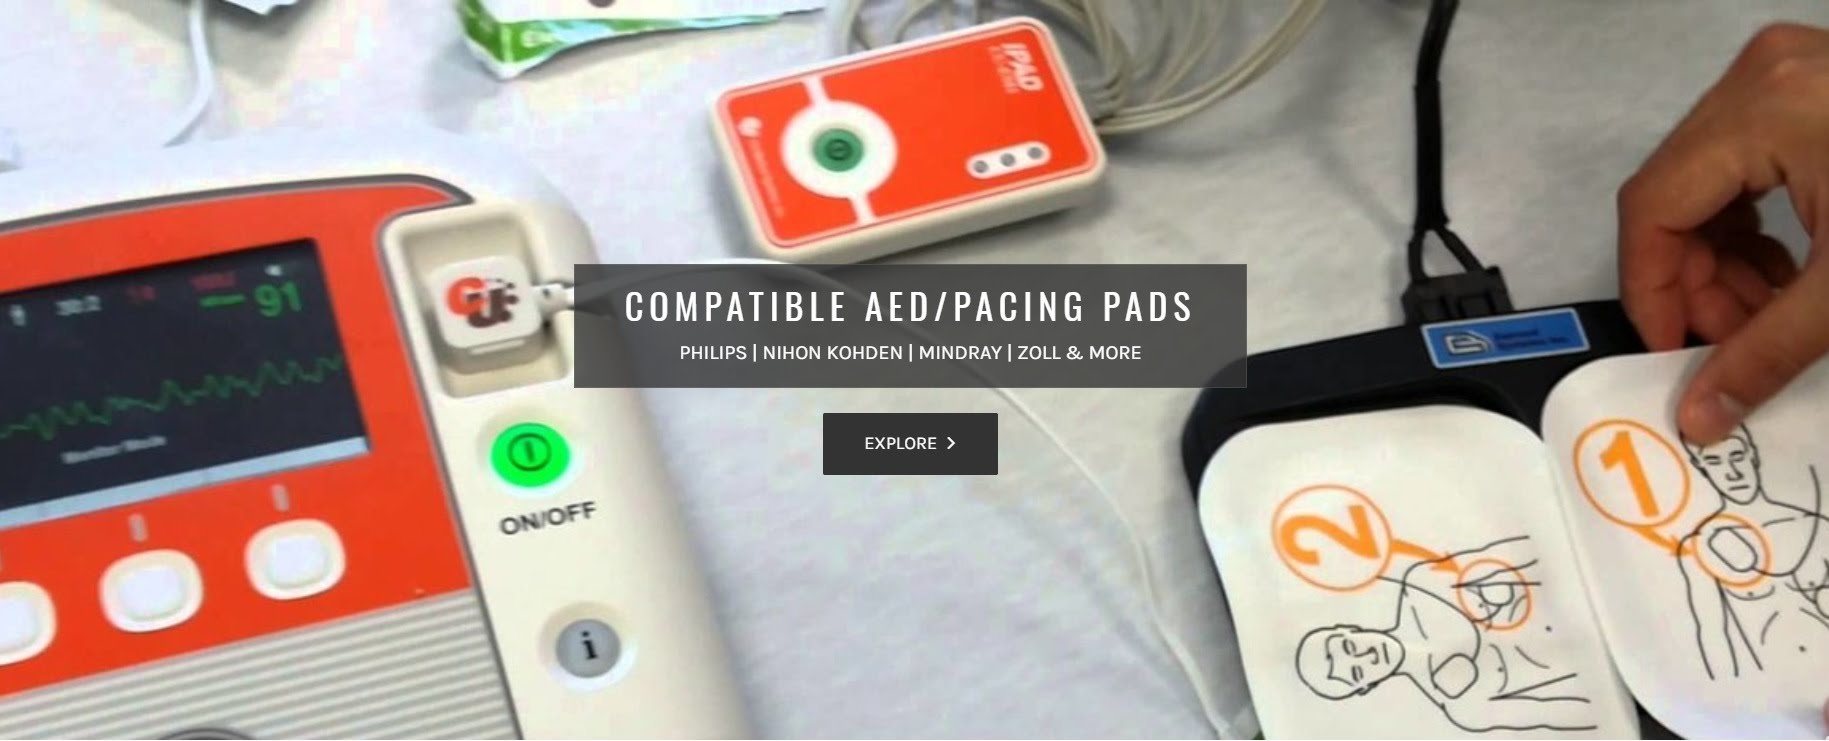 https://digitexstore.com/t/defibrillator-pads